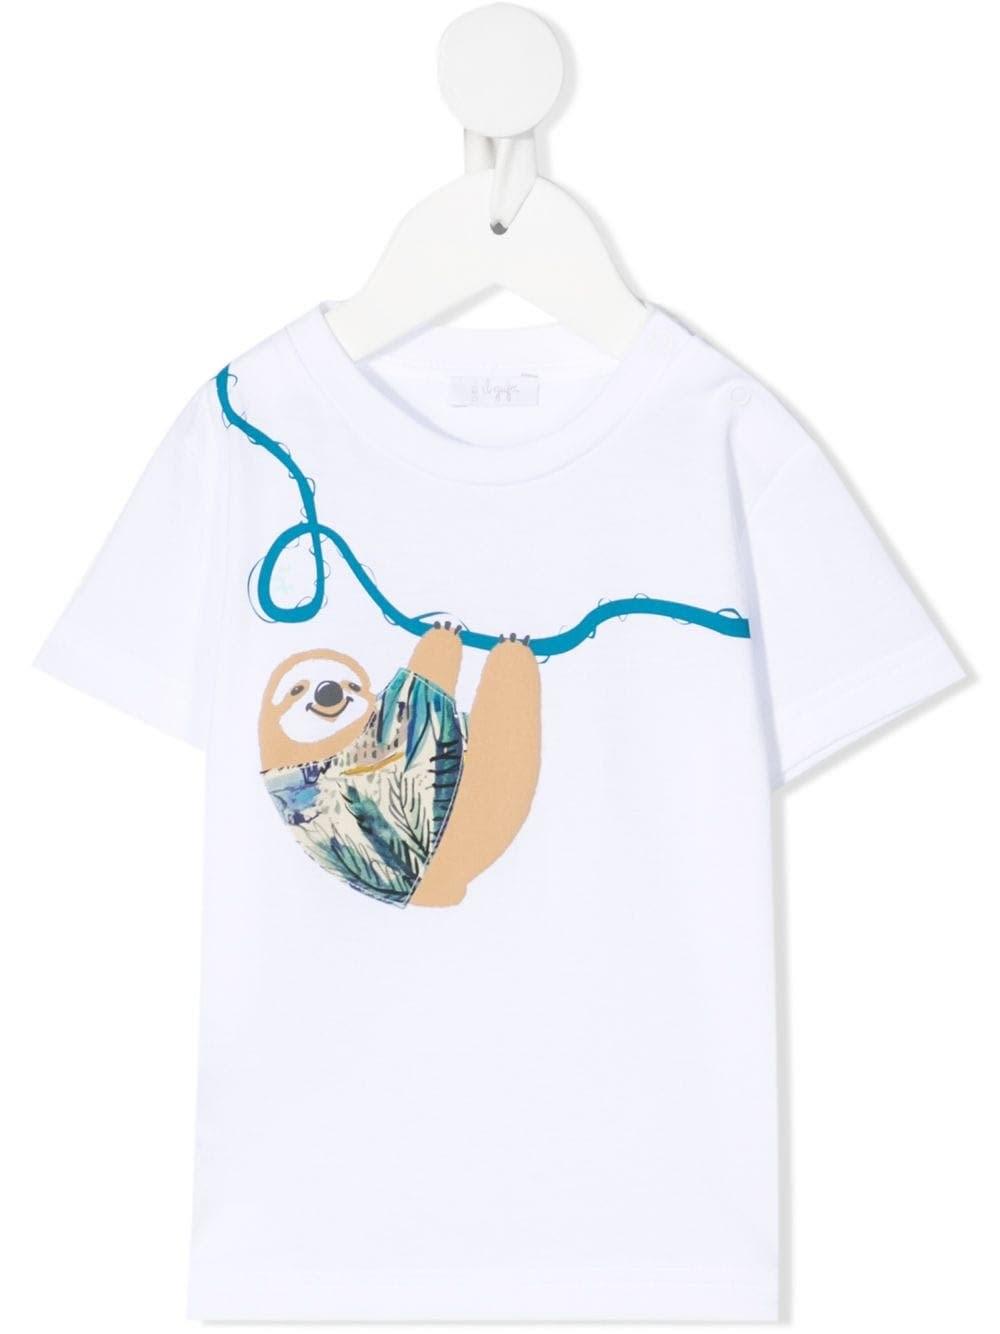 Il Gufo Cottons SLOTH JERSEY T-SHIRT